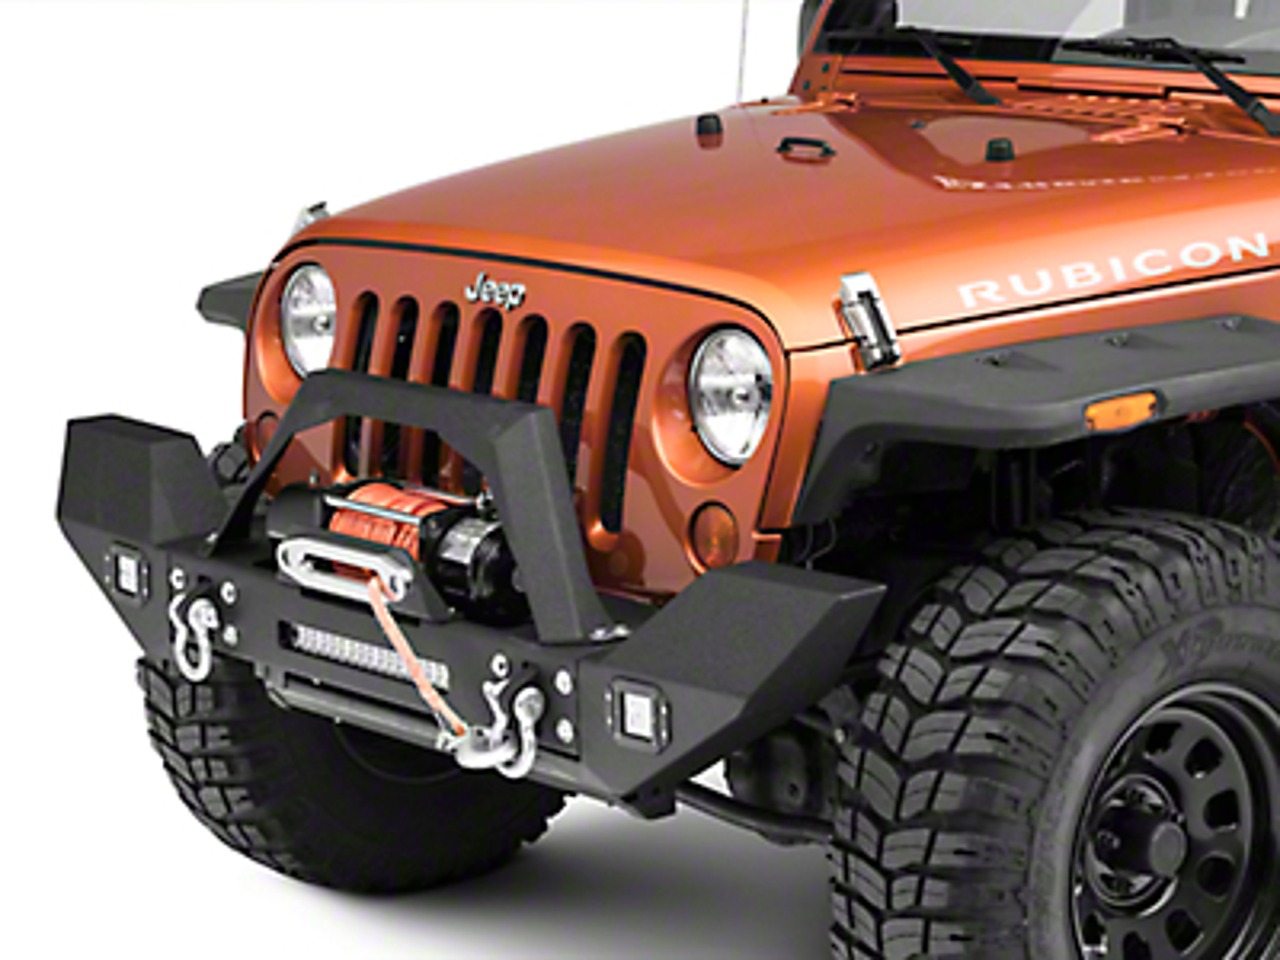 RedRock 4x4 Max-HD Full Width Front Bumper w/ LED Light Bar, Fog Lights & Winch Mount (07-18 Wrangler JK)